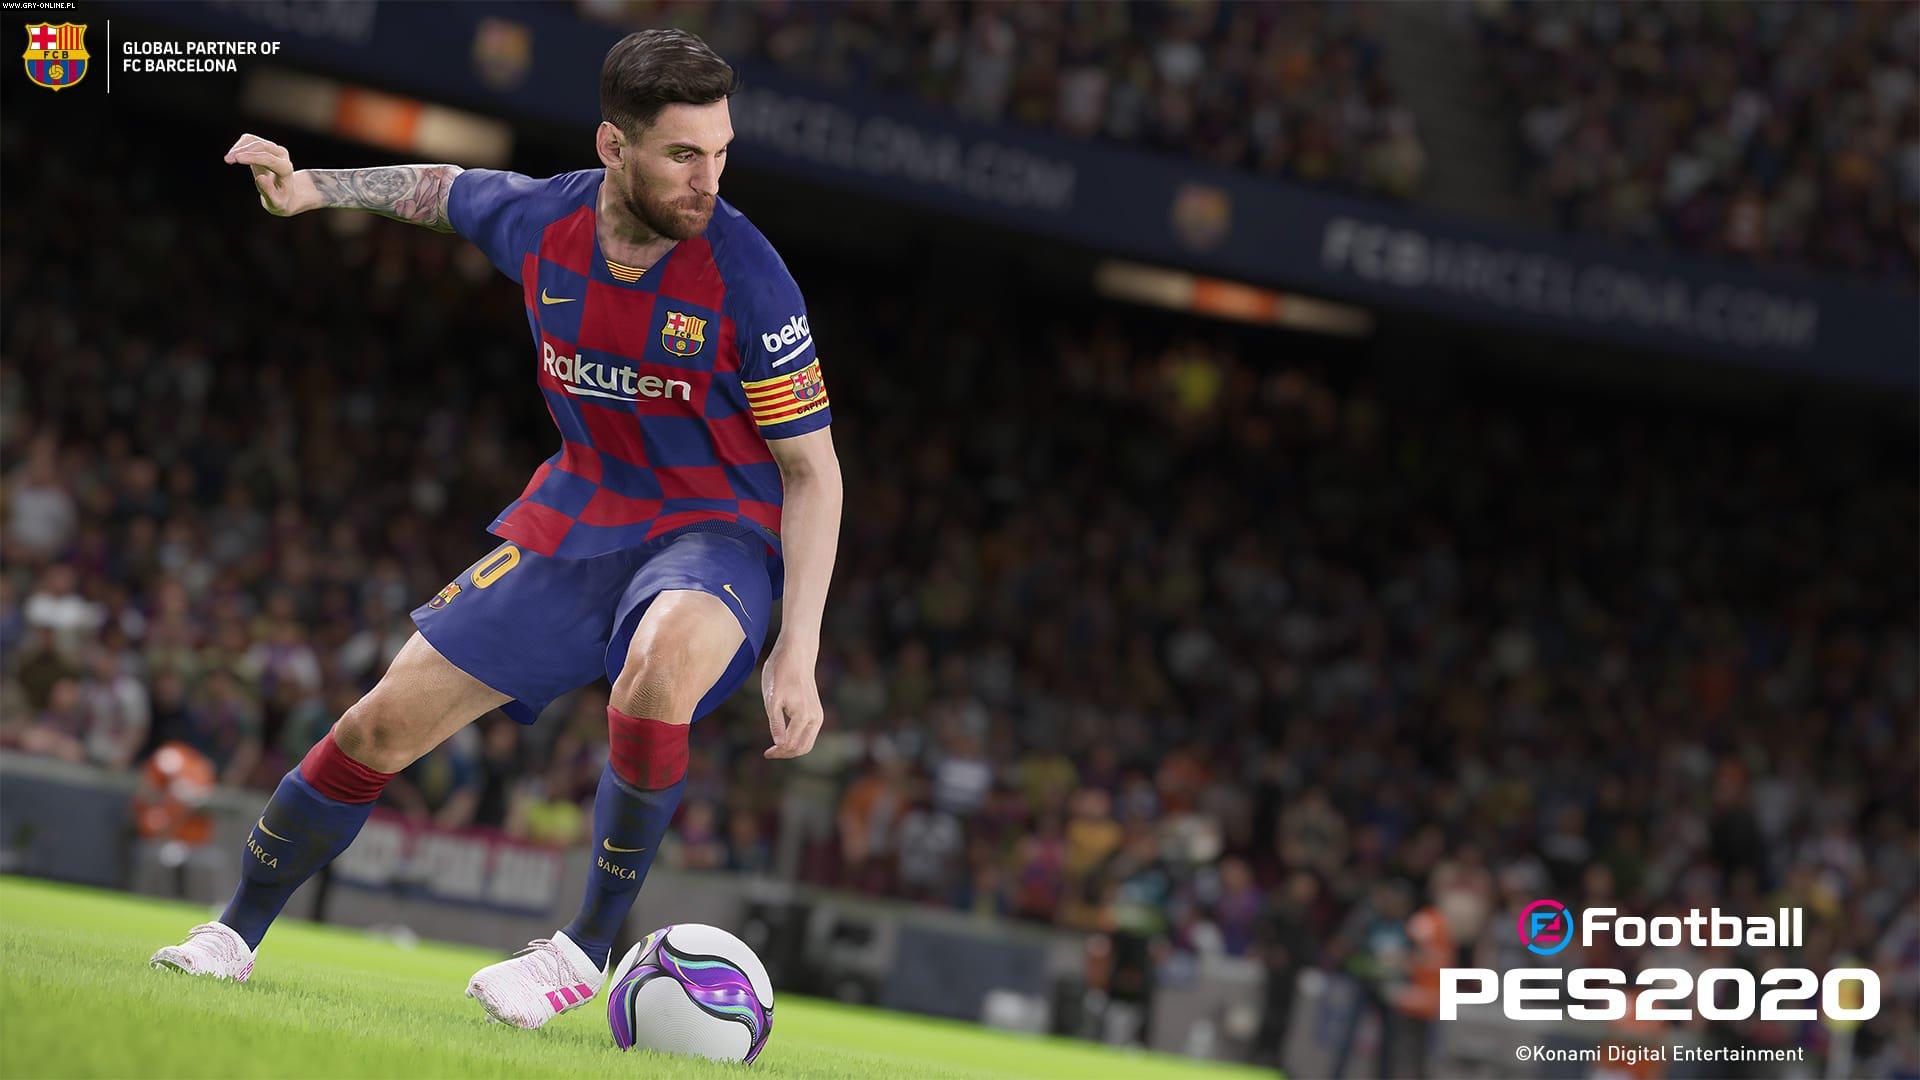 eFootball PES 2020 PC, PS4, XONE Games Image 6/25, Konami